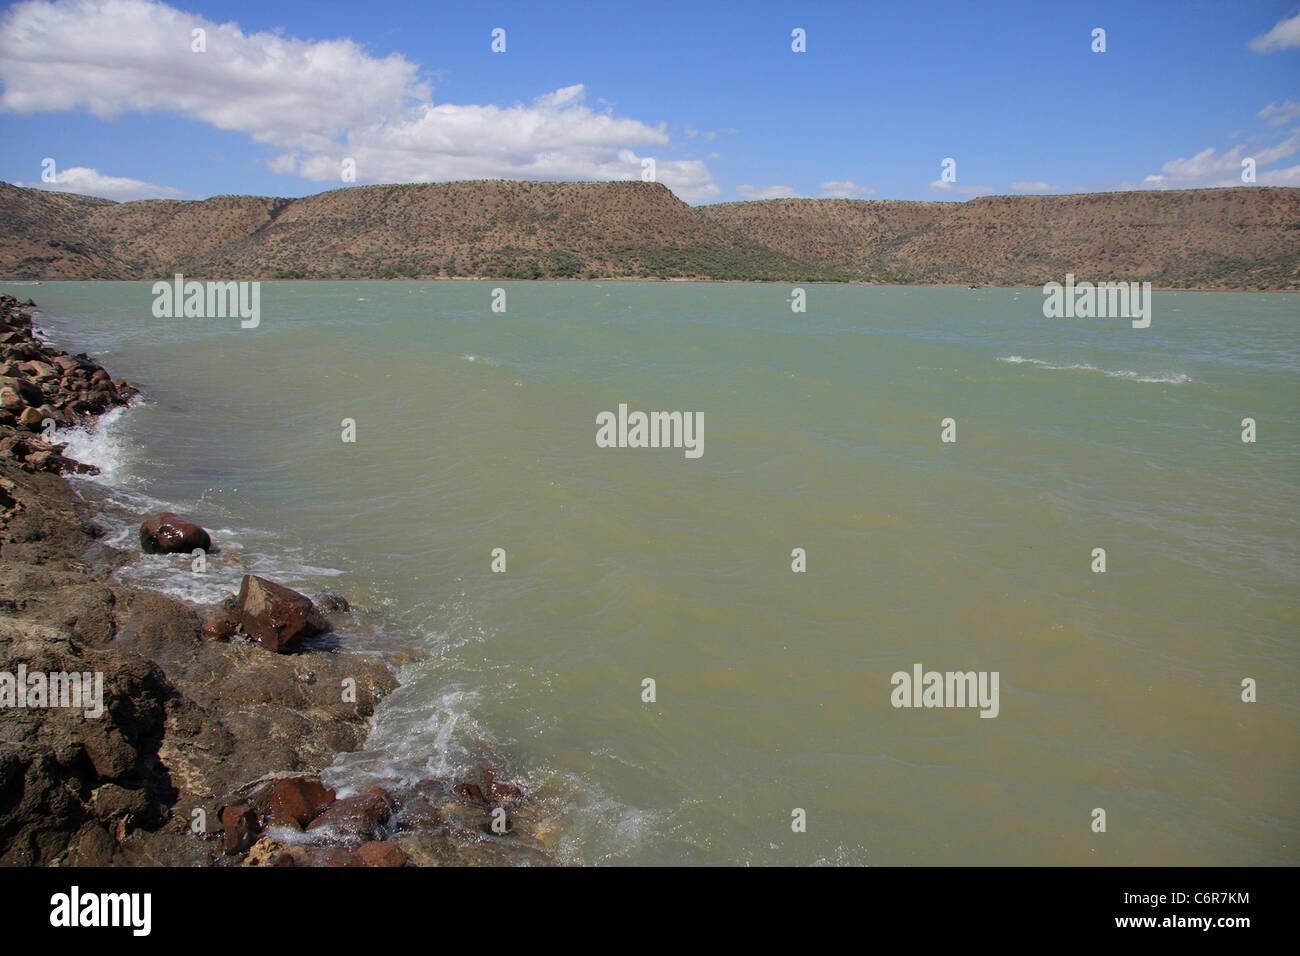 View over Van Der Kloof Dam in rough conditions - Stock Image